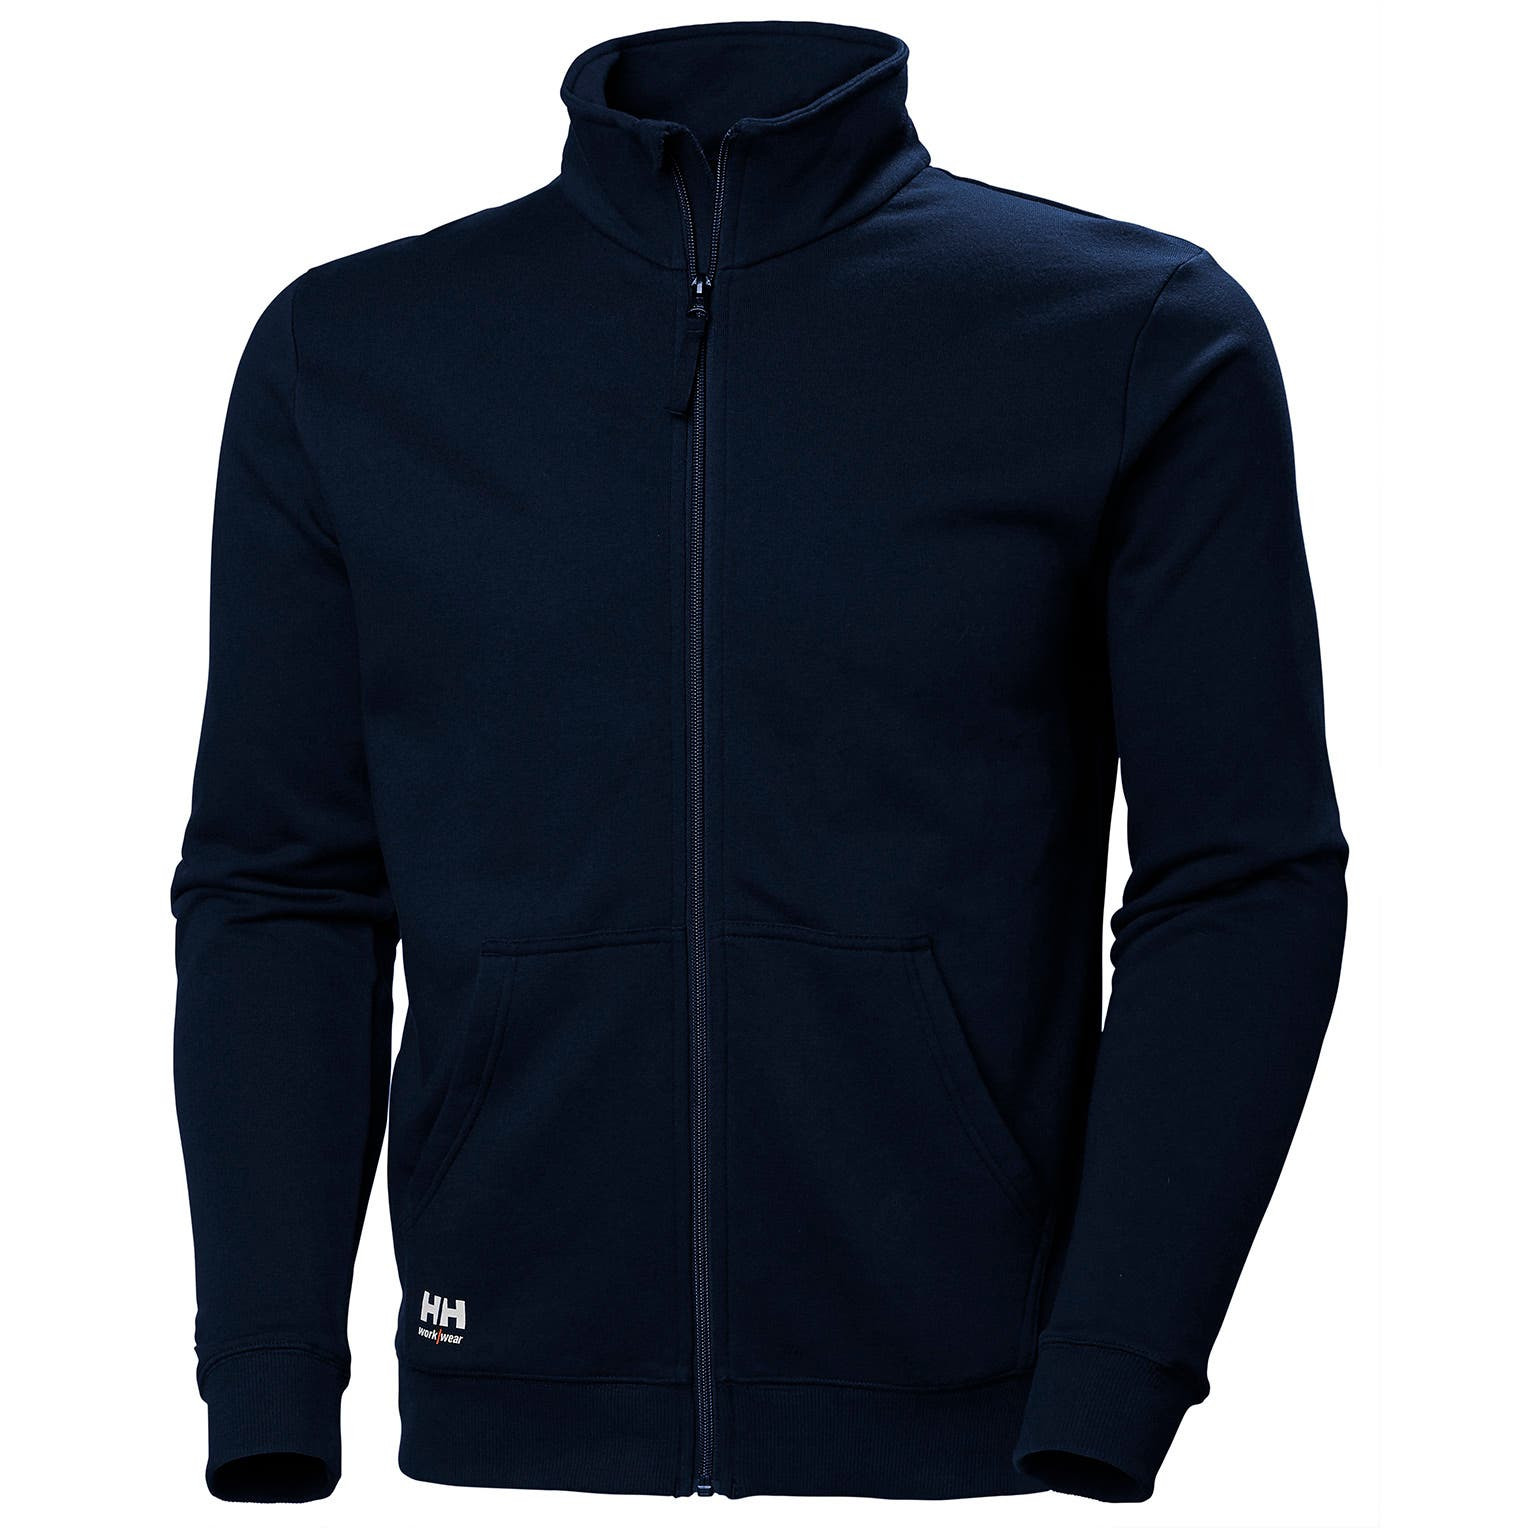 Свитшот на молнии Helly Hansen Manchester Zip Sweatshirt - 79212 (Navy; S)